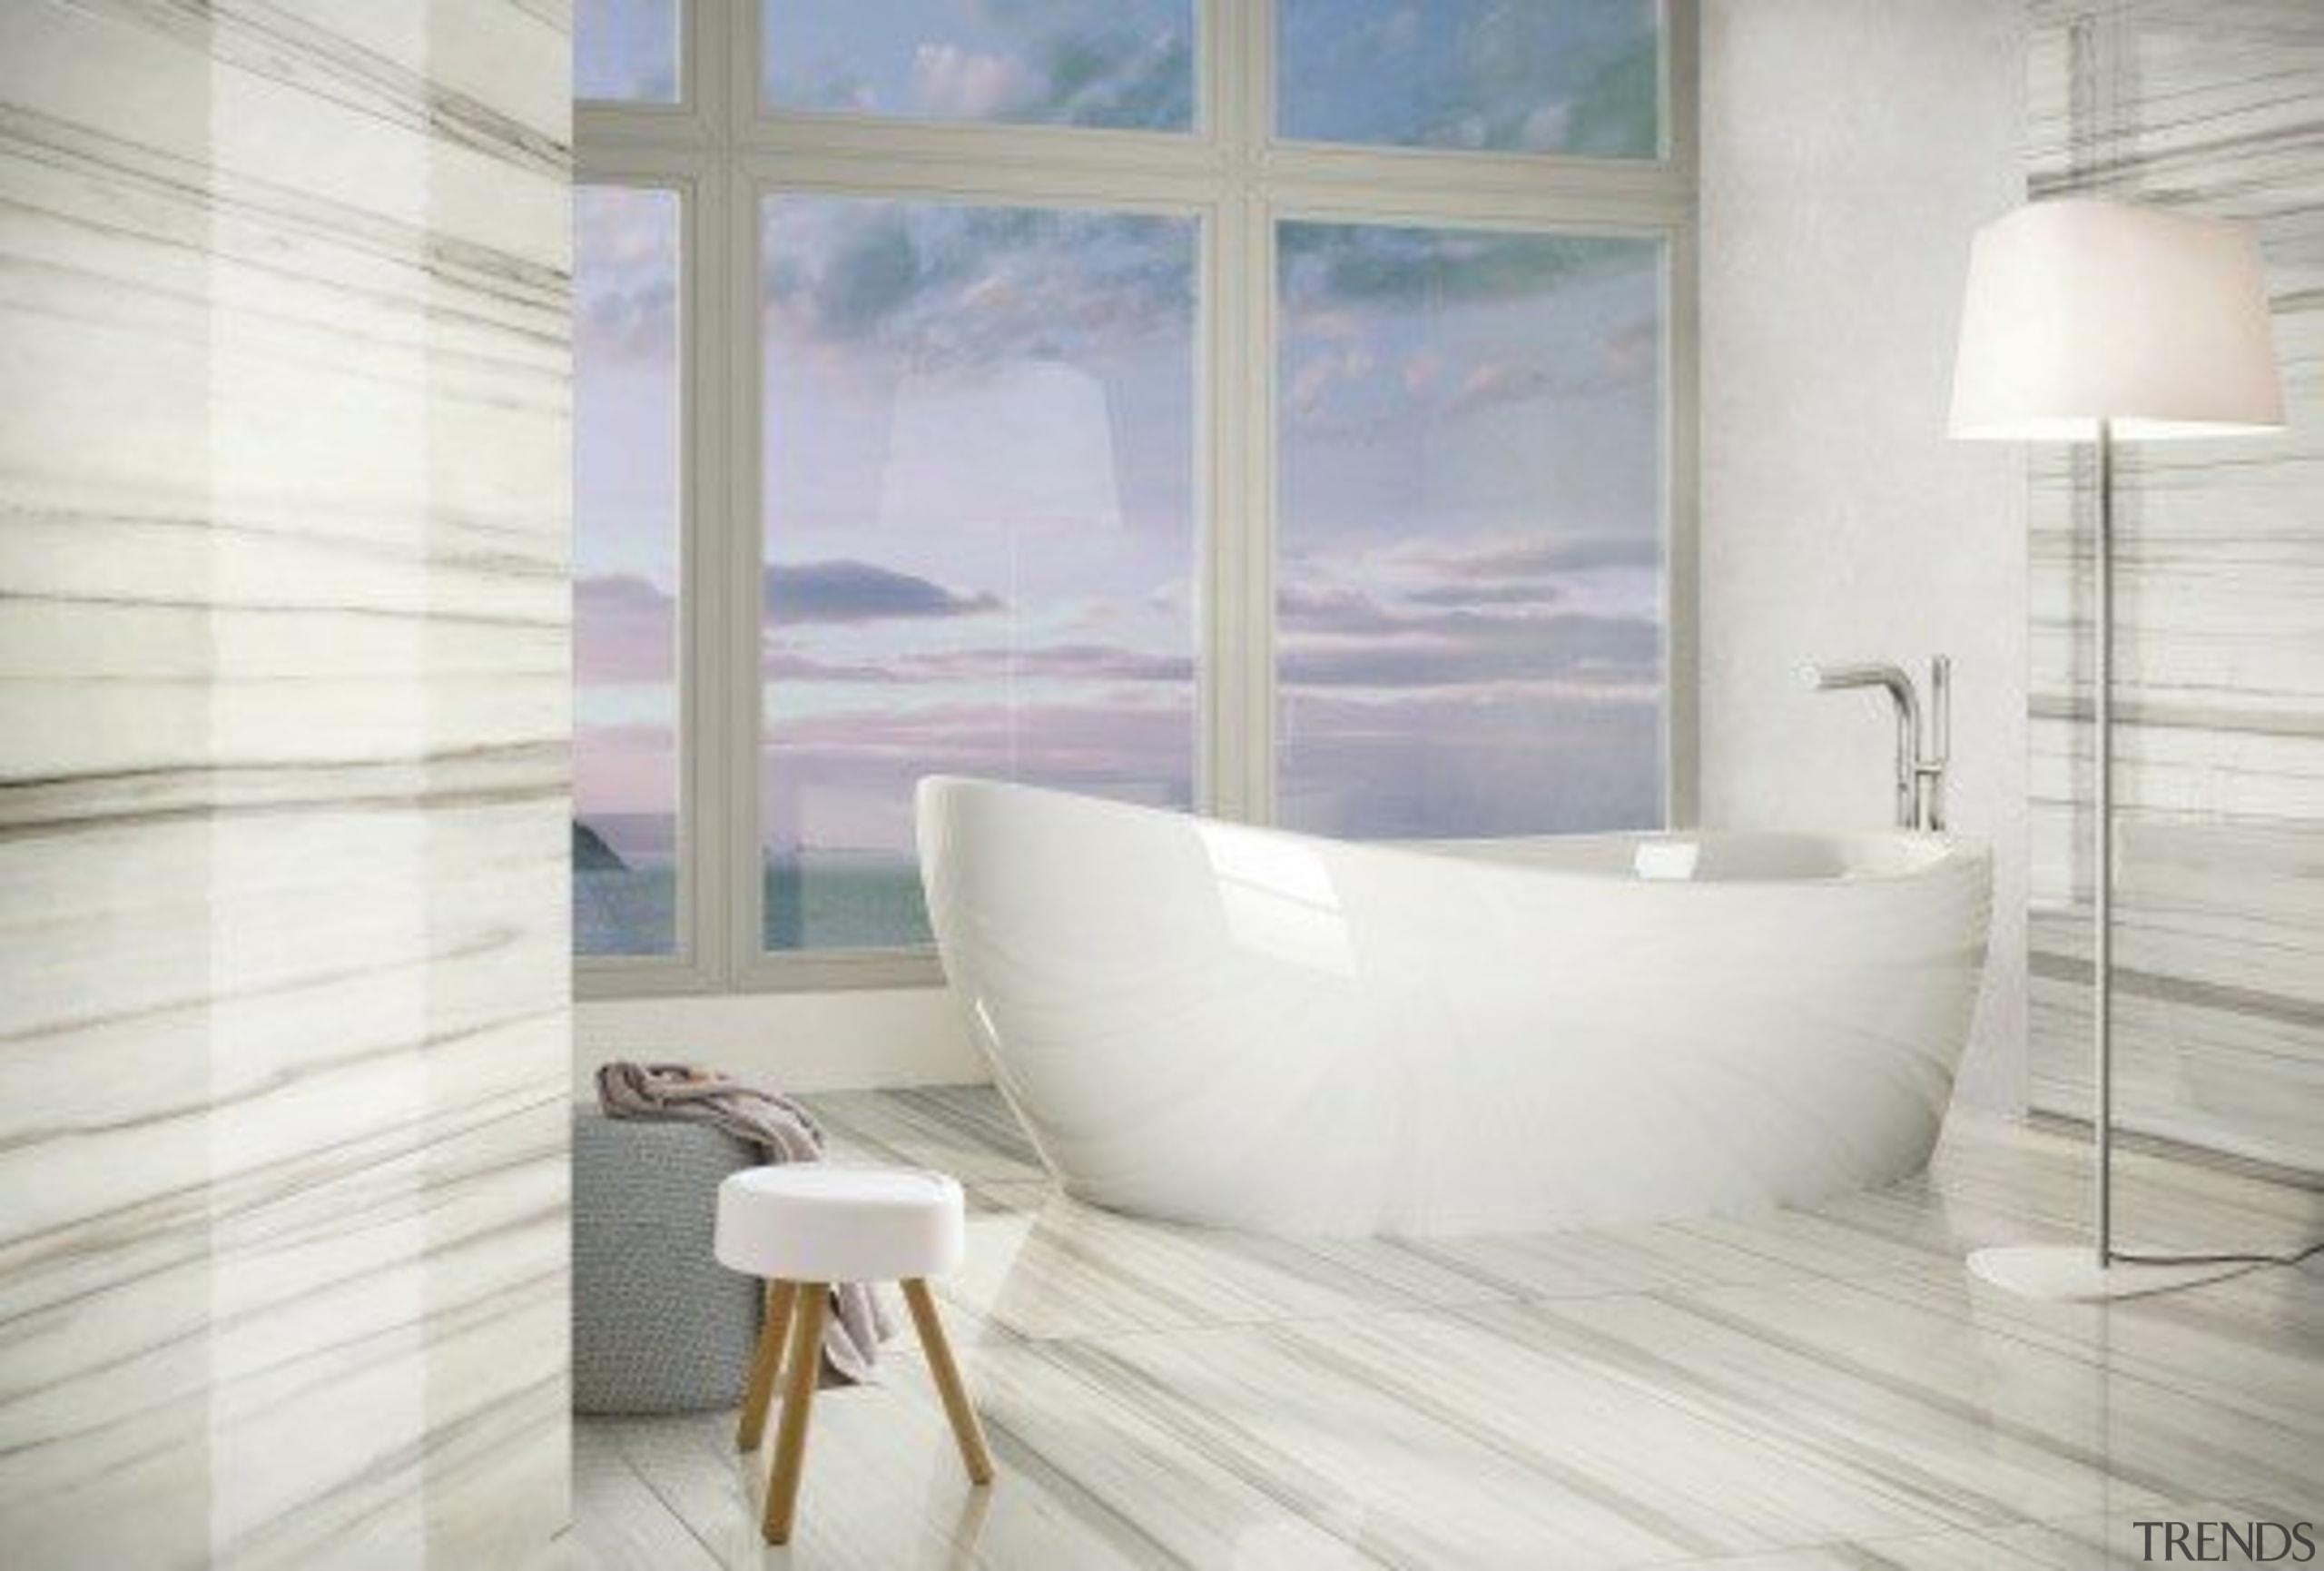 Marmo Zebrino - Marmo Zebrino - bathroom | bathroom, ceramic, floor, flooring, home, interior design, plumbing fixture, product design, room, tap, tile, toilet seat, wall, window, white, gray